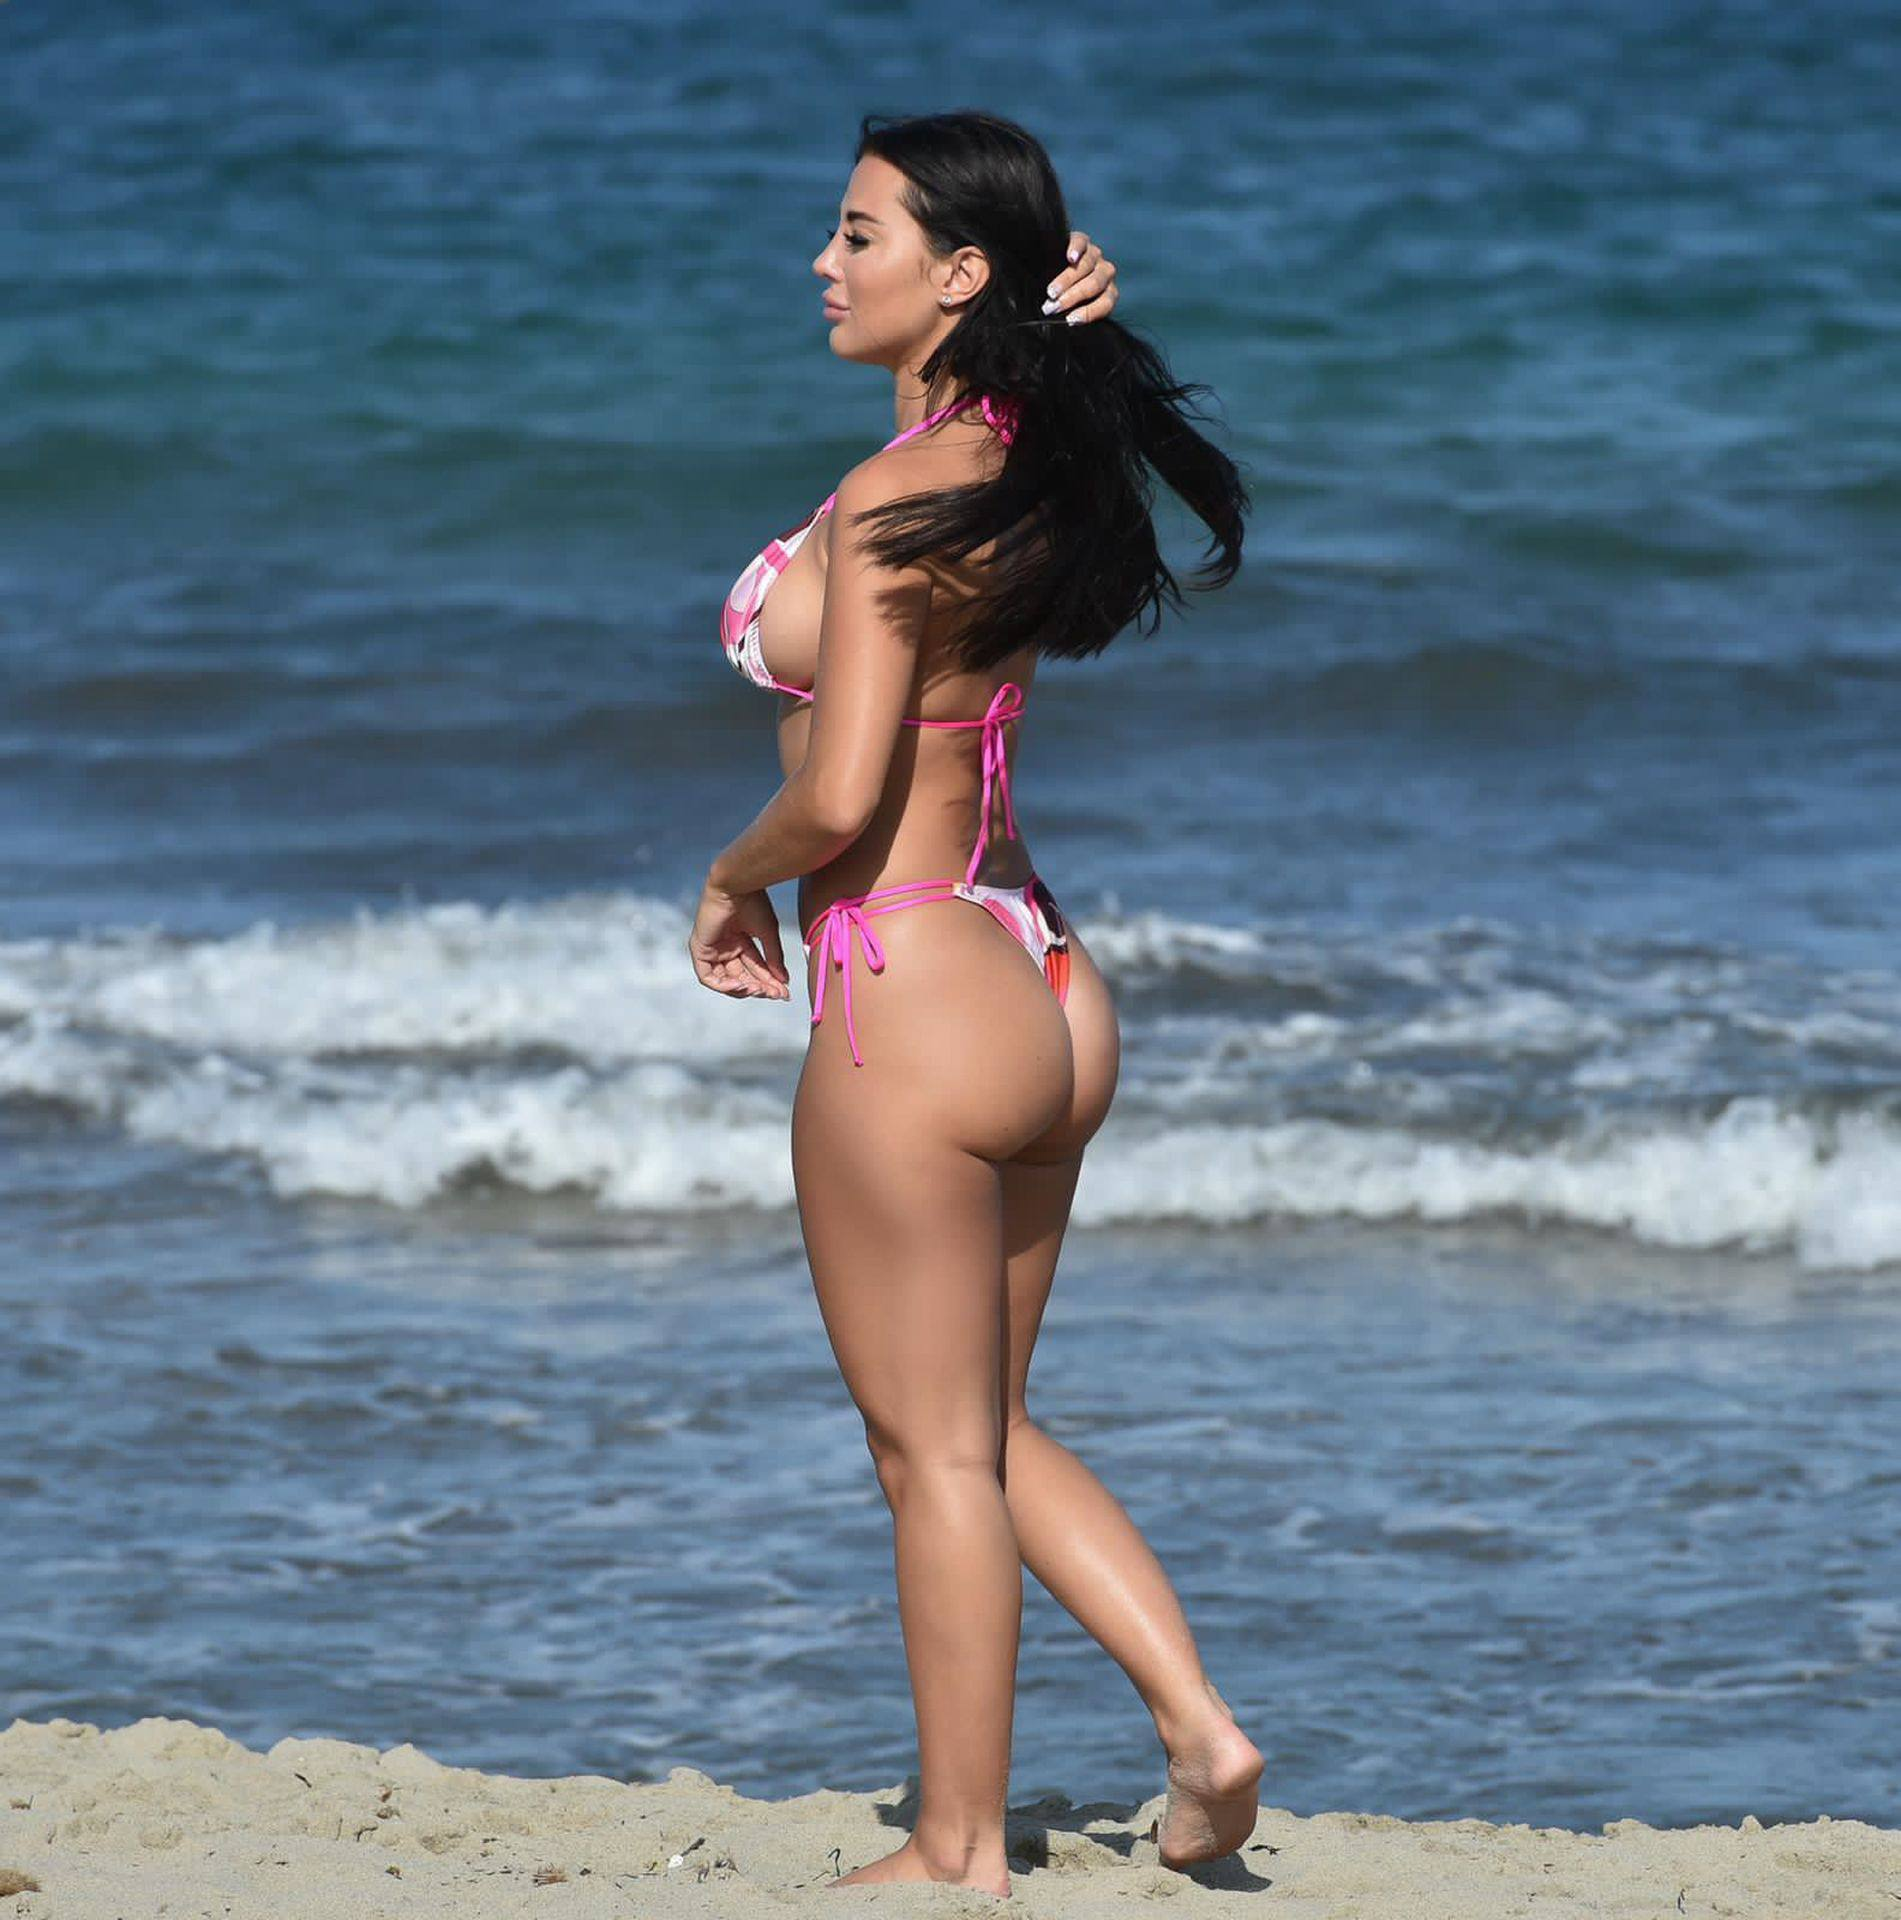 Yazmin Oukhellou Hot In Bikini